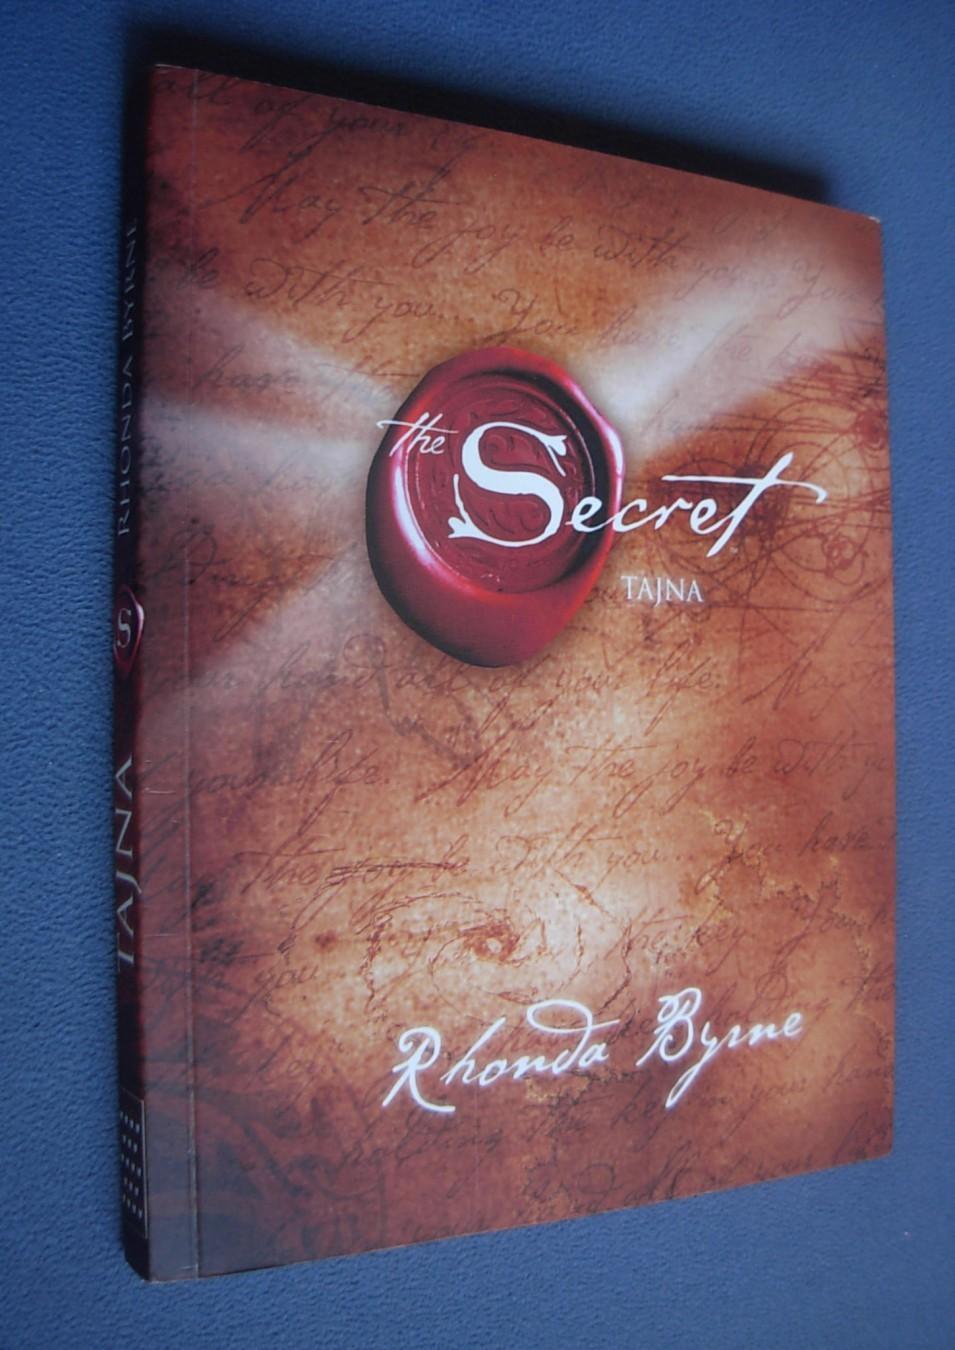 Rhonda Byrne Tajna ( The Secret By Rhonda Byrne) PDF DOWNLOAD